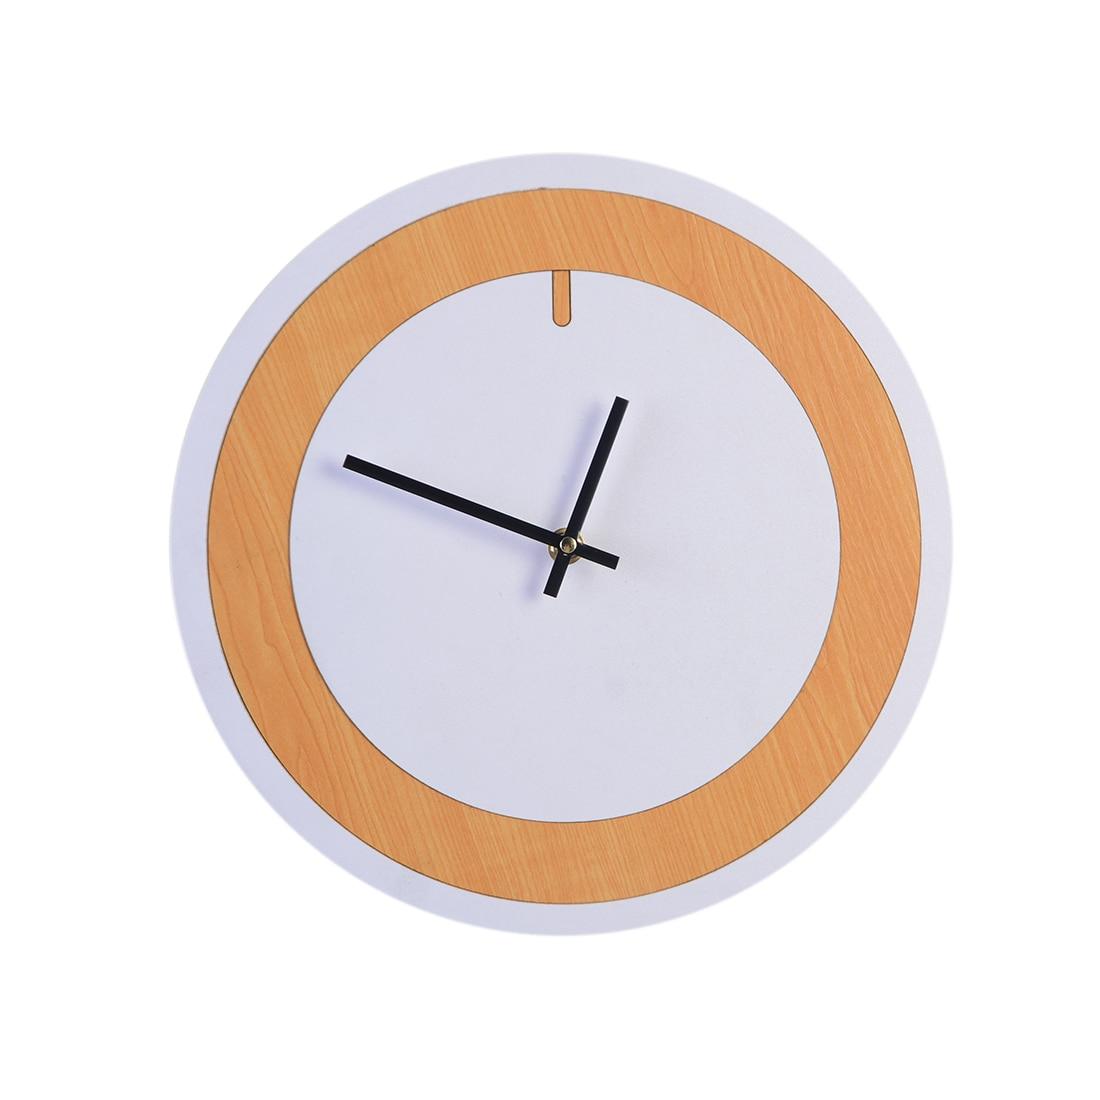 30Cm Two-Color Simple Silent Wall Clocks Home Decor Hanging Clock Quartz Watch Wall Clock Modern Design Hot Sale